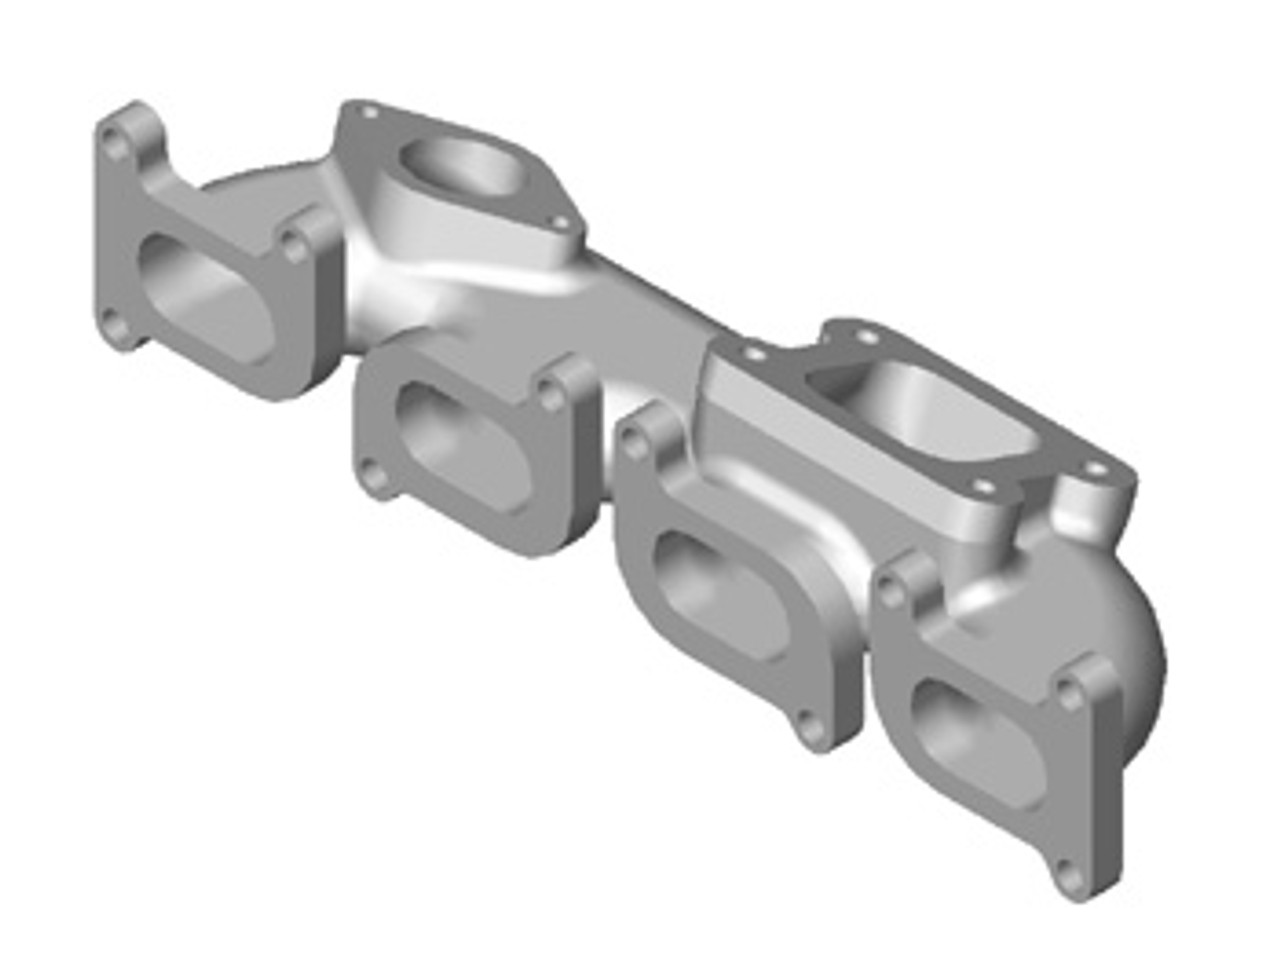 SRT-4 AGP Cast T3 Manifold